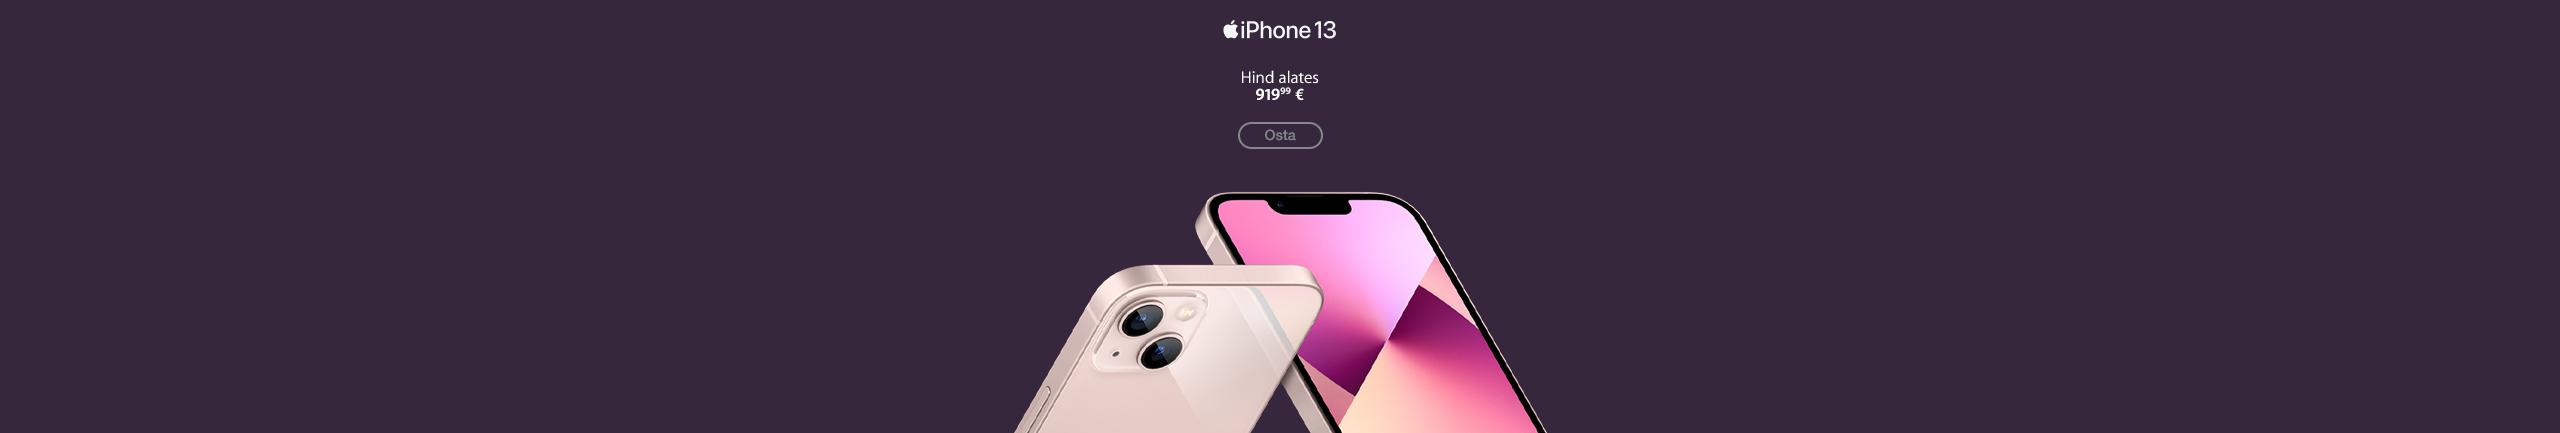 NPL Buy Apple iPhone 13